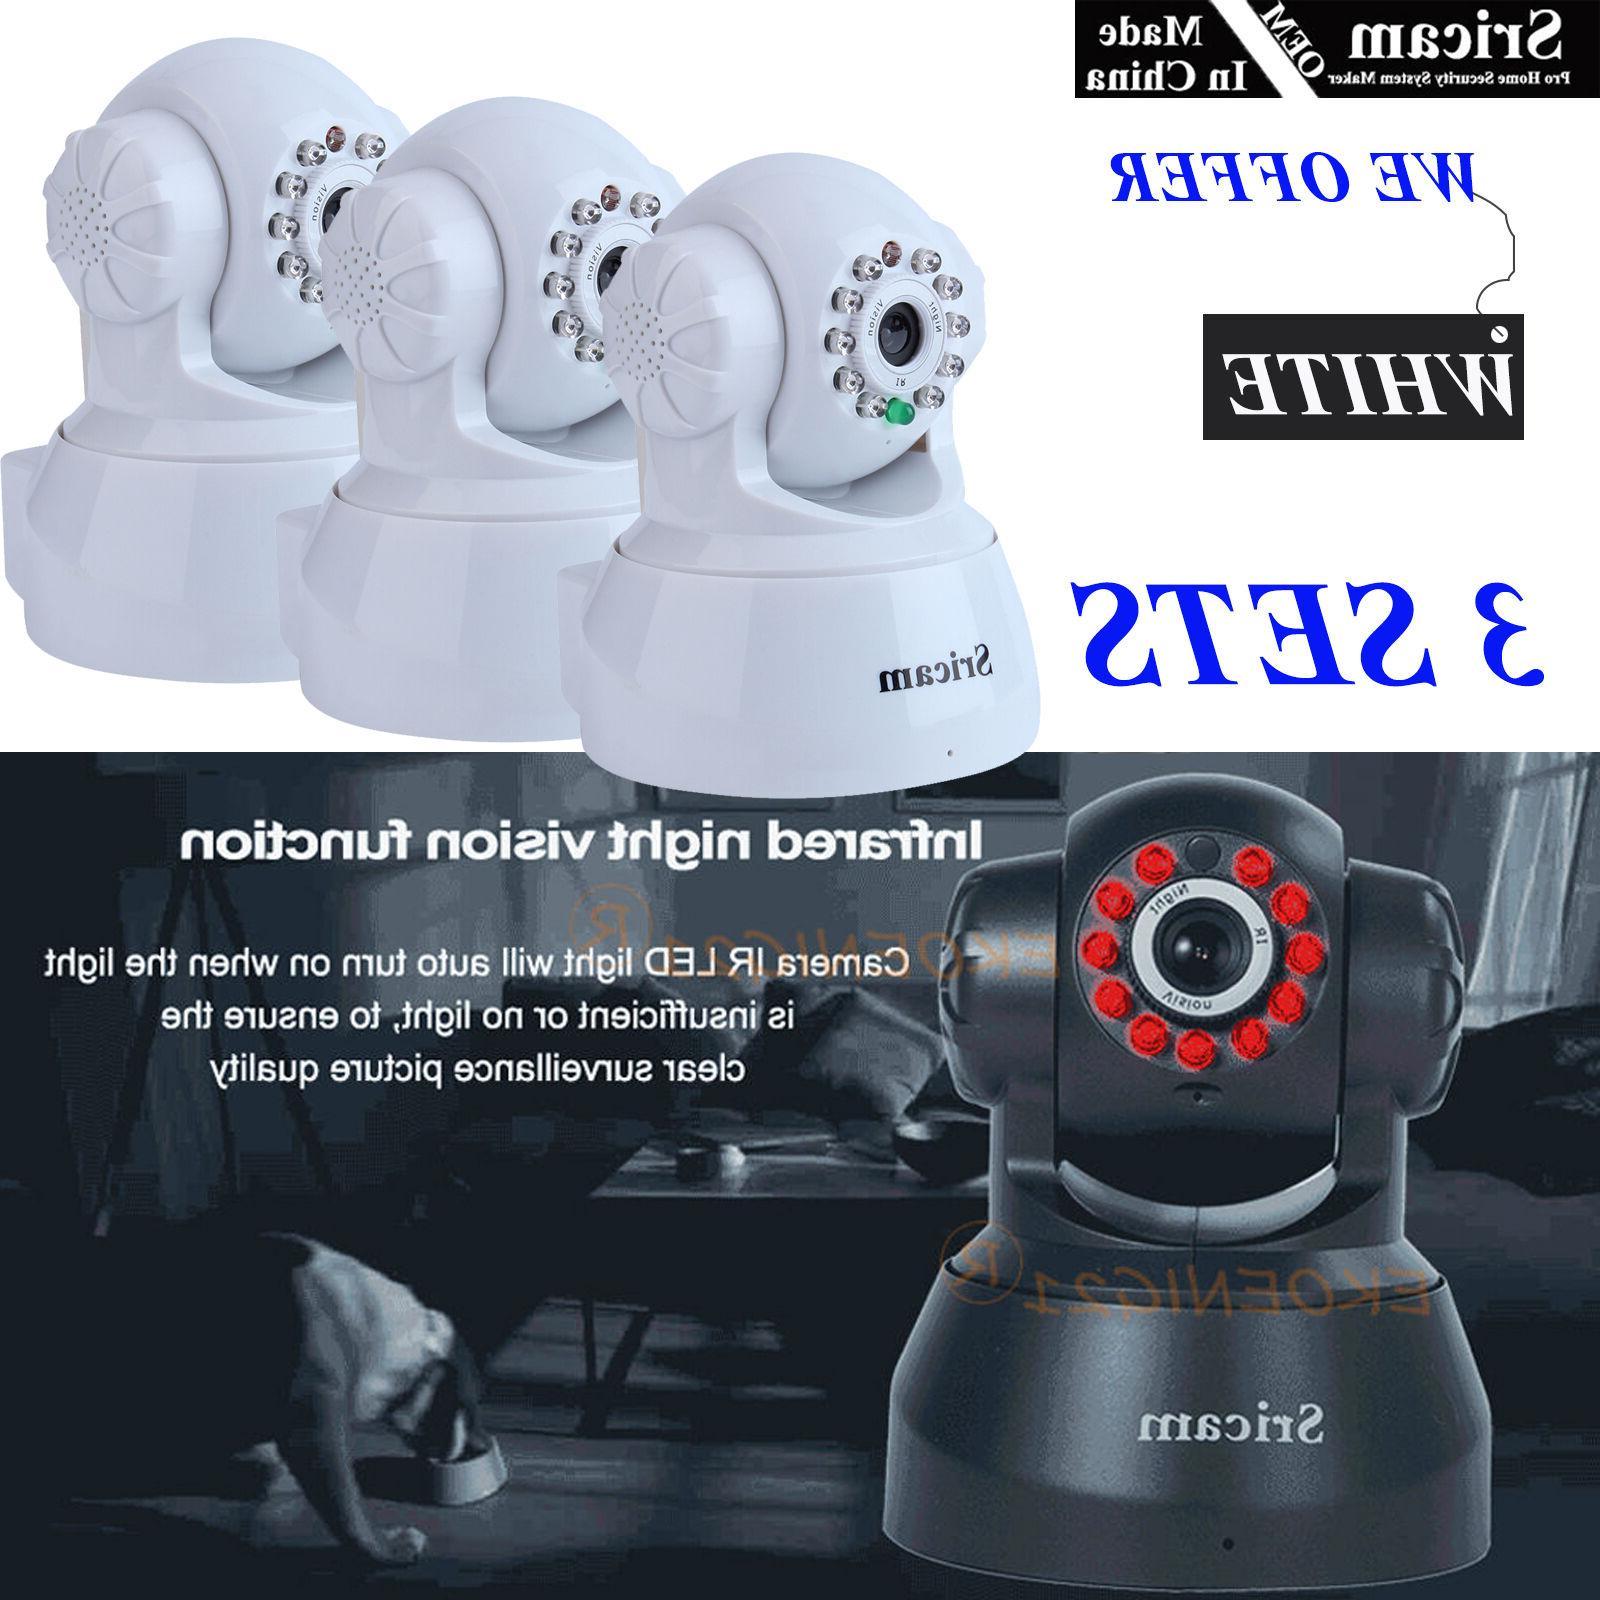 3 Set of OEM Sricam 720P Wireless IP Camera WiFi Security Ni